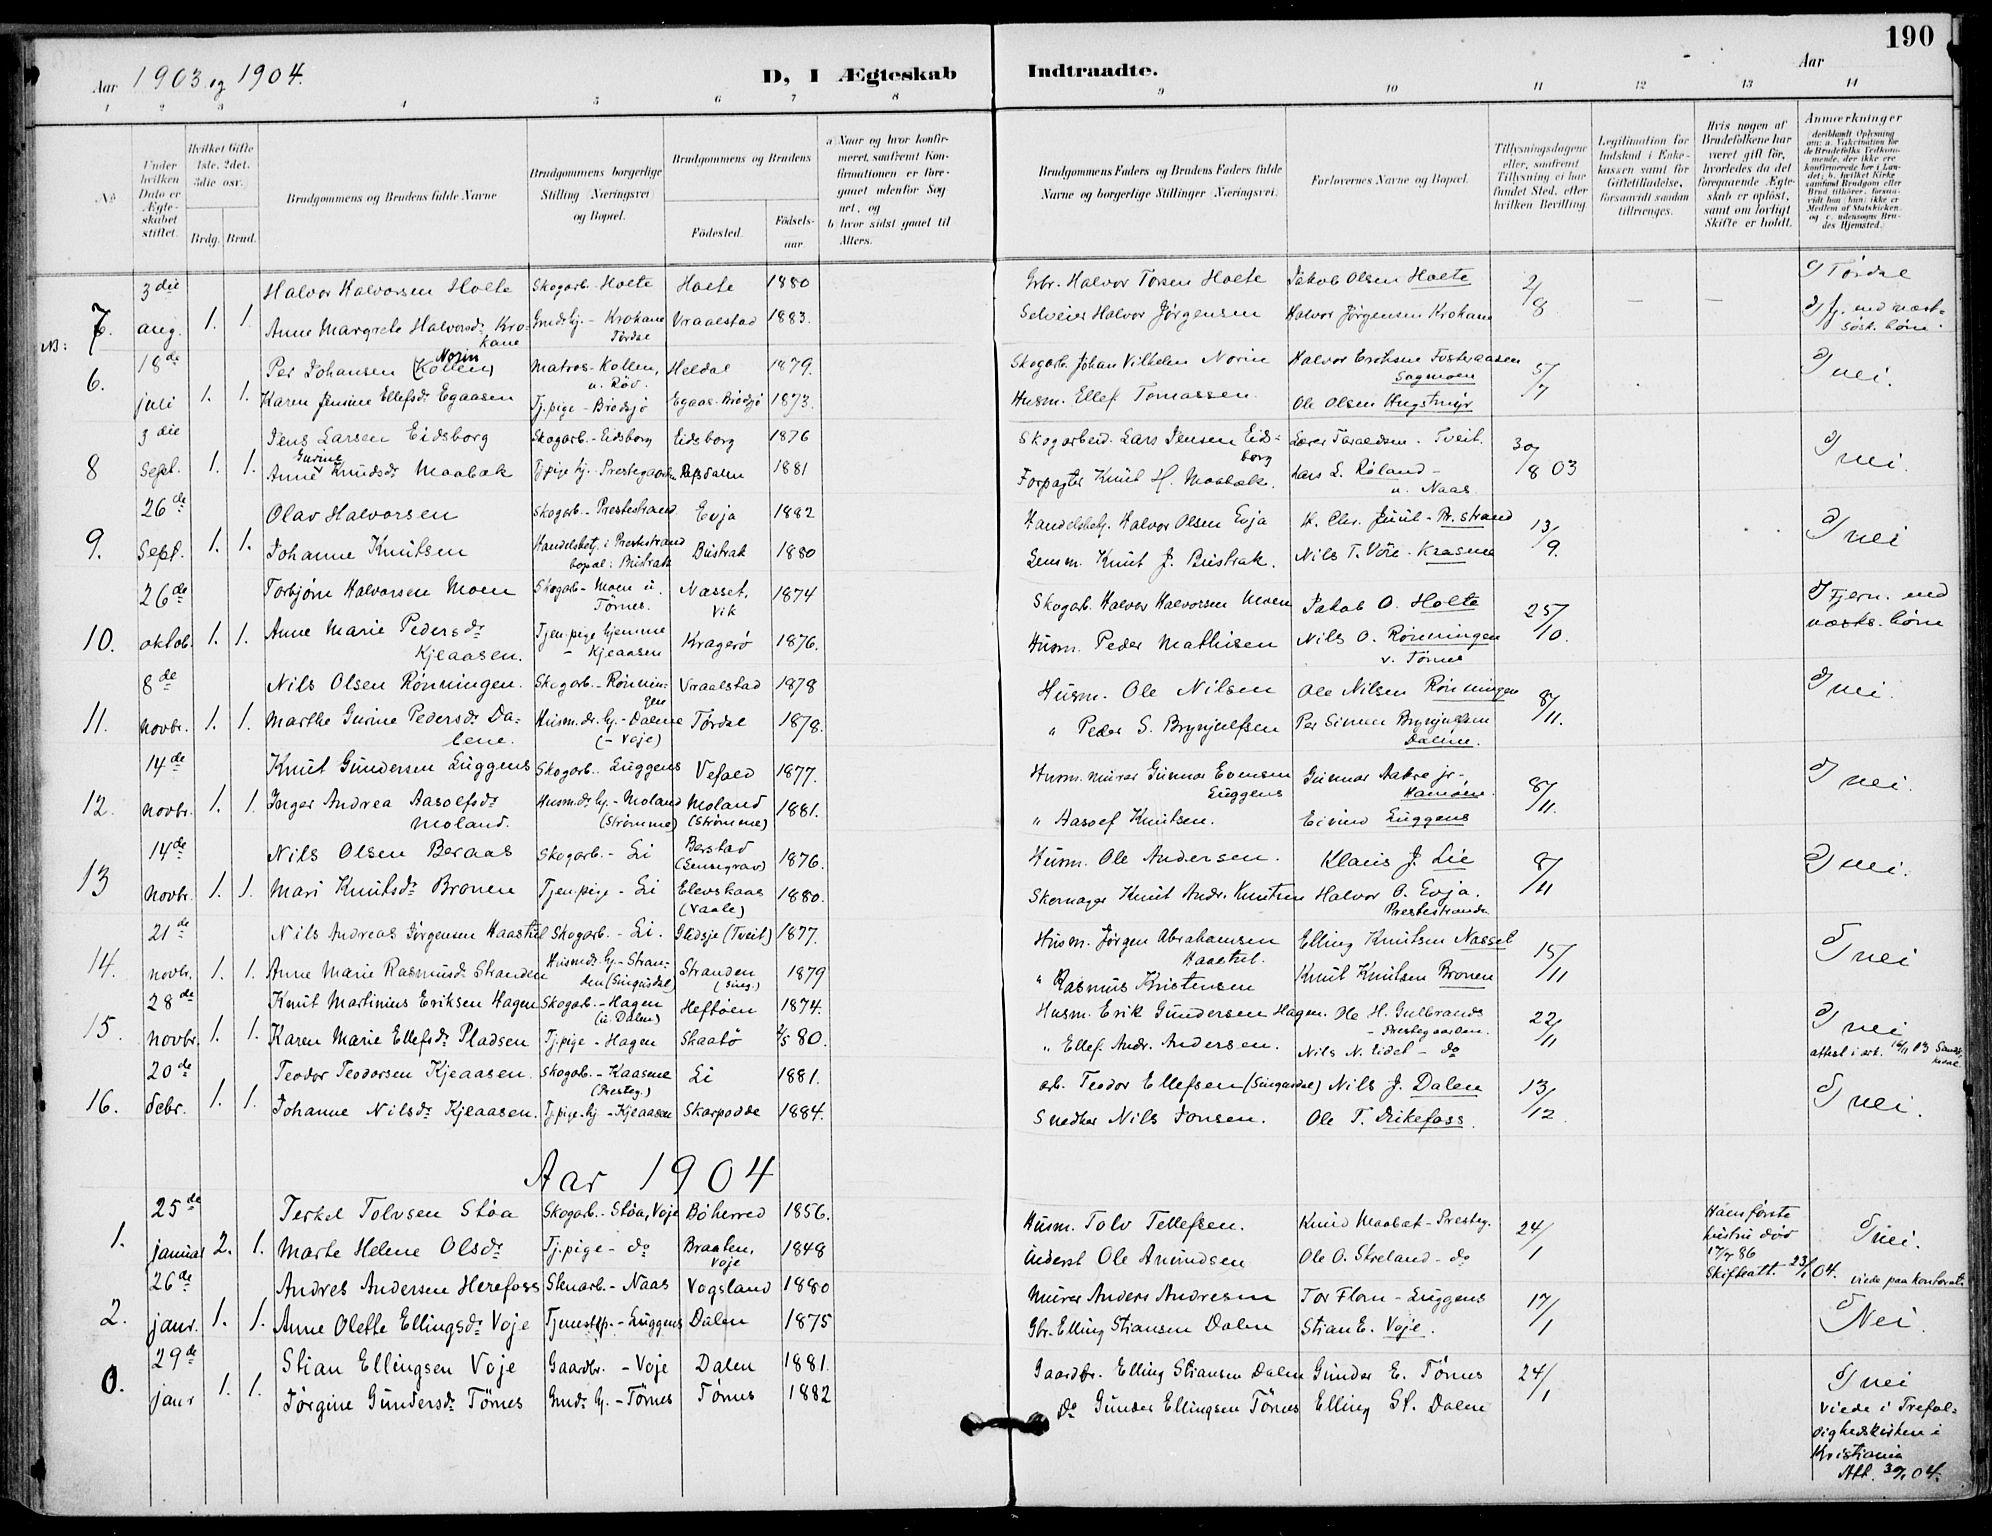 SAKO, Drangedal kirkebøker, F/Fa/L0012: Ministerialbok nr. 12, 1895-1905, s. 190